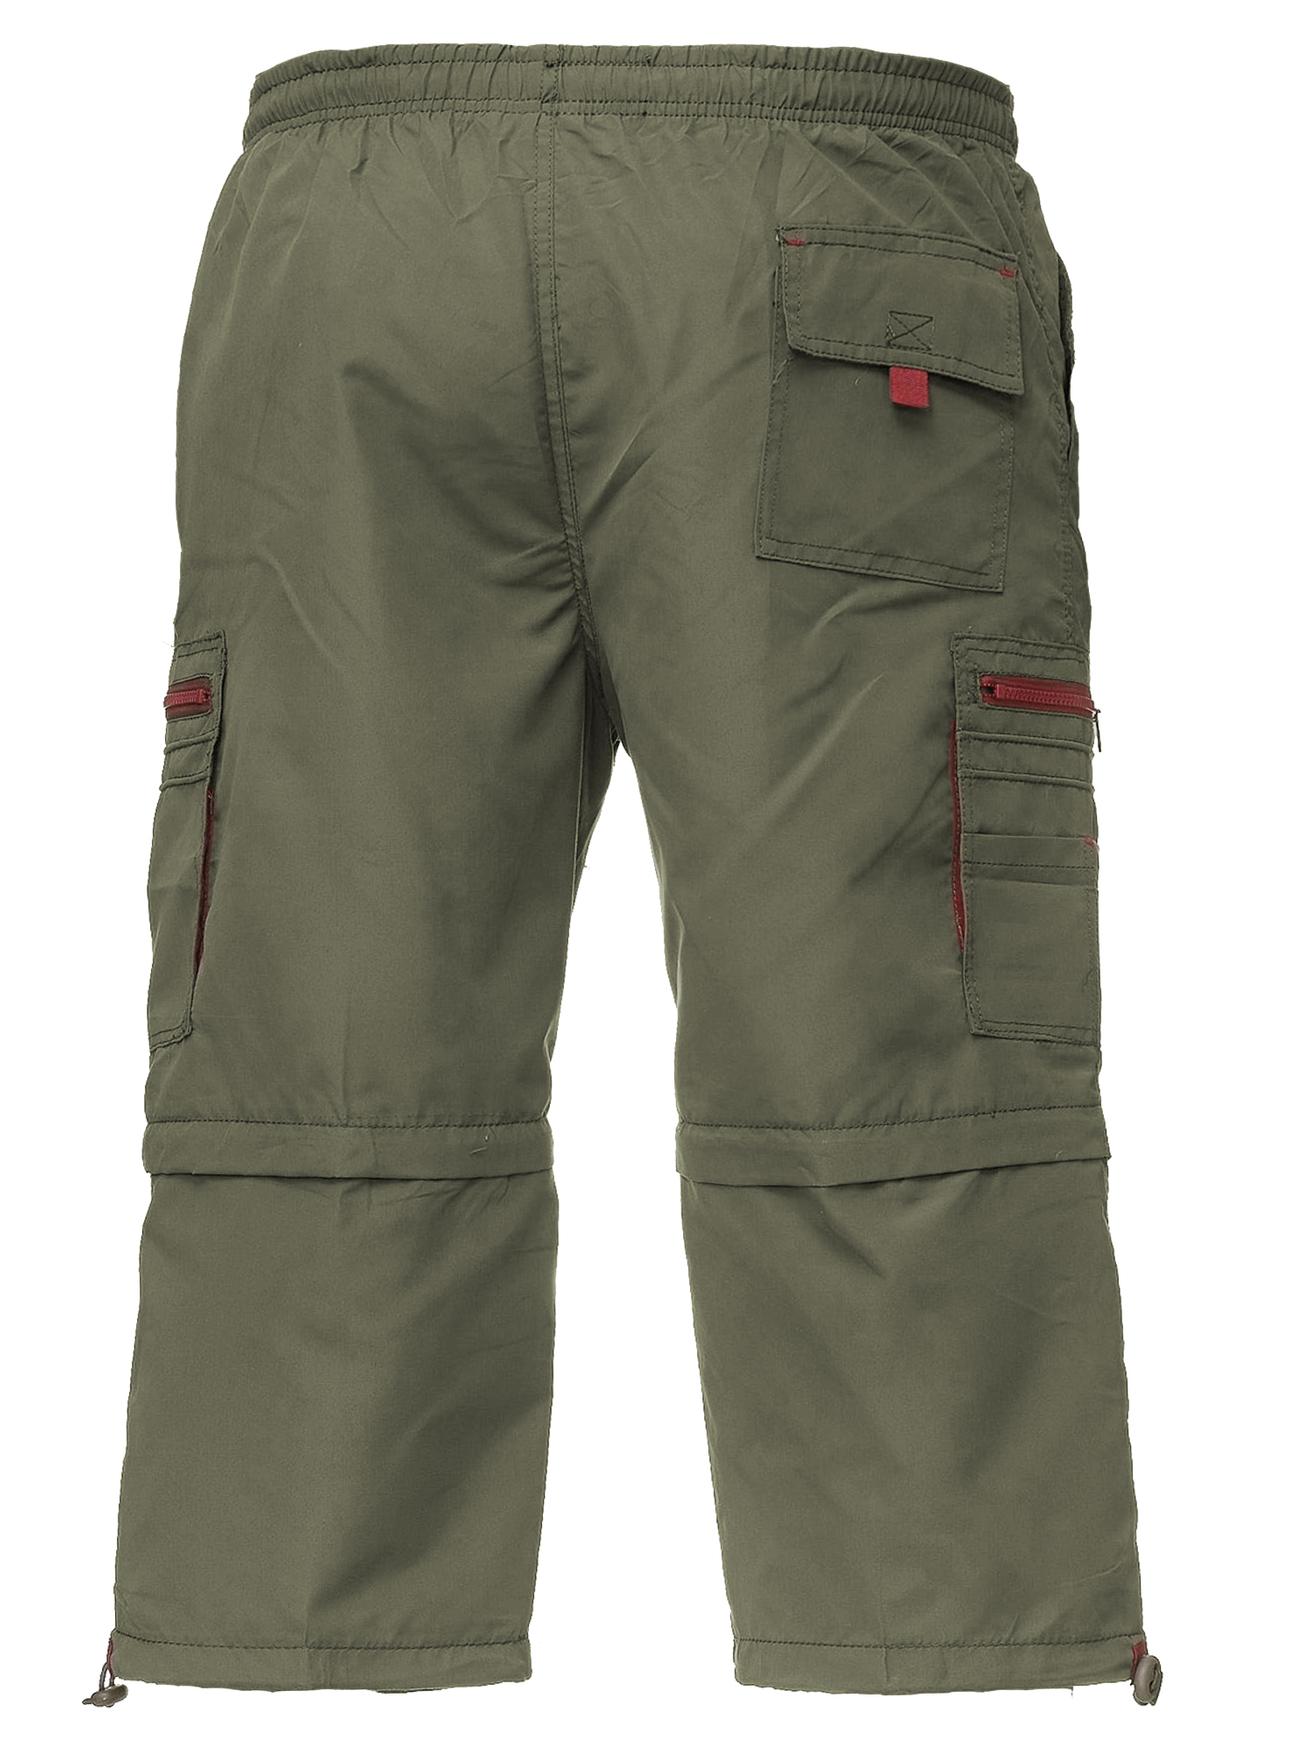 Pantaloni da uomo Cargo Shorts Zip Pants 3 4 Breve Bermuda 7 8 2 ... f0d382af75